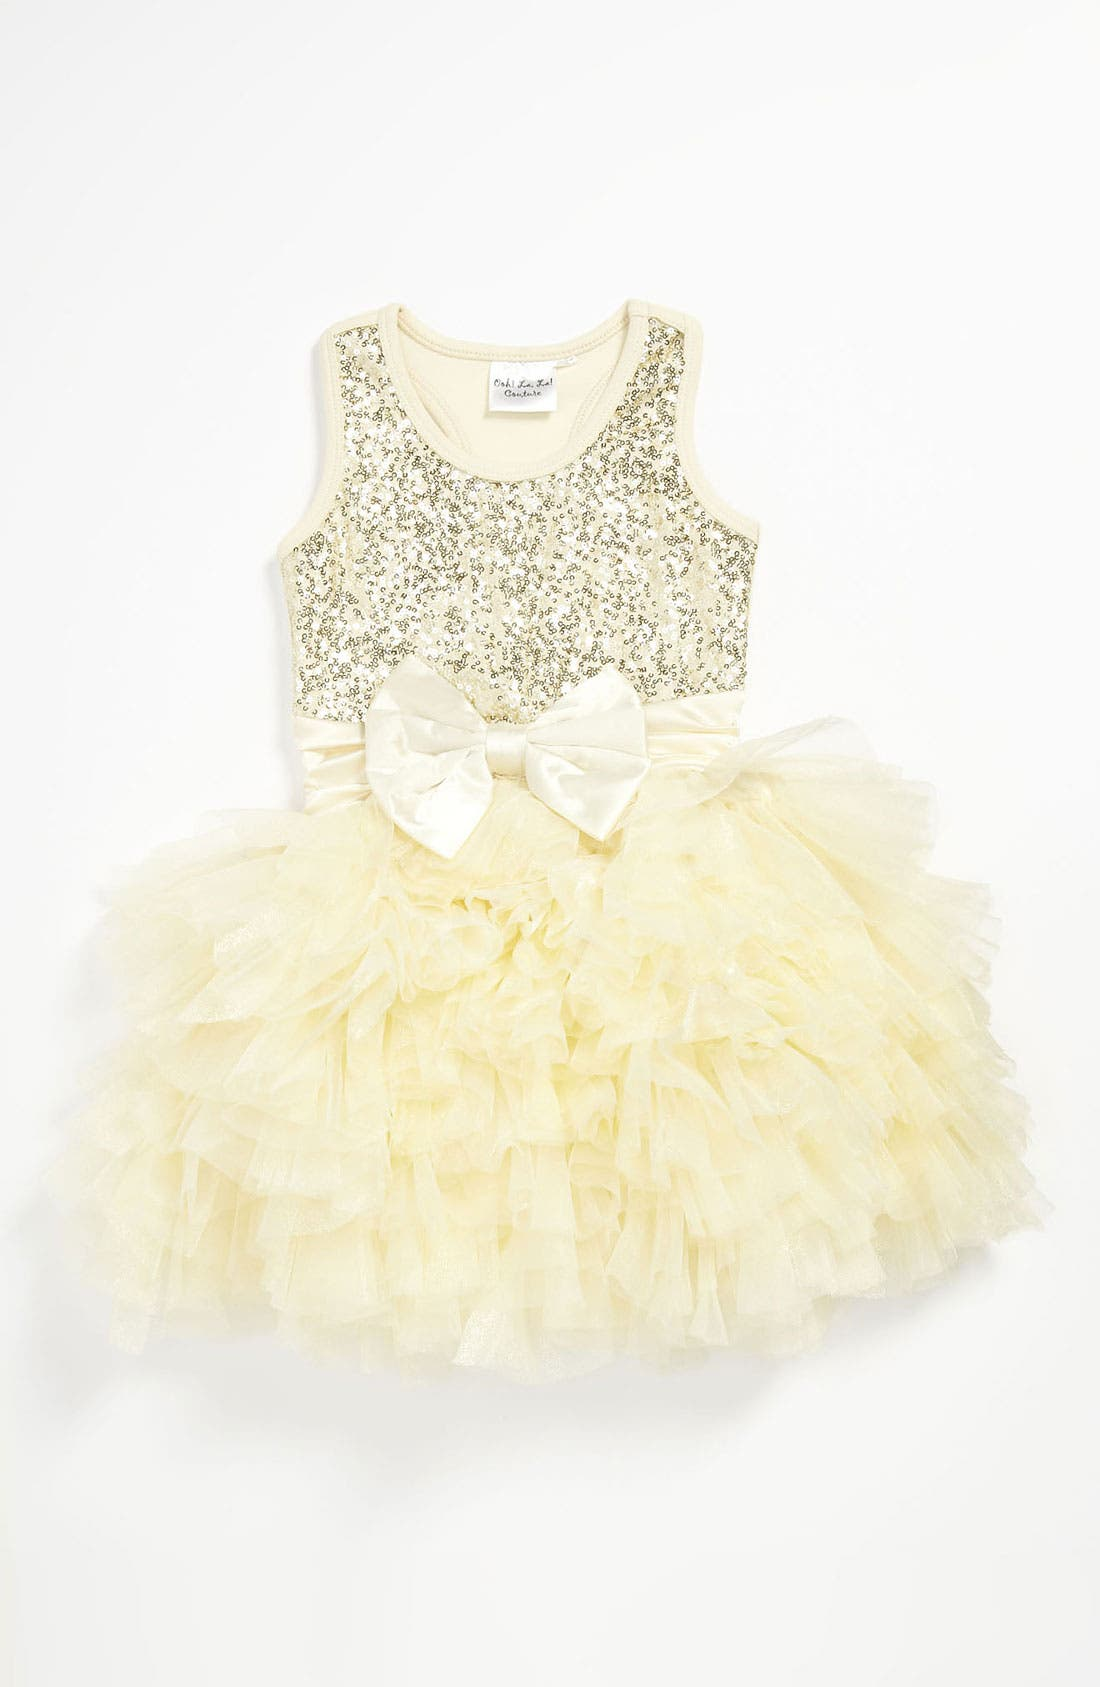 Alternate Image 1 Selected - Ooh! La, La! Couture 'Wow Dream' Dress (Little Girls & Big Girls)